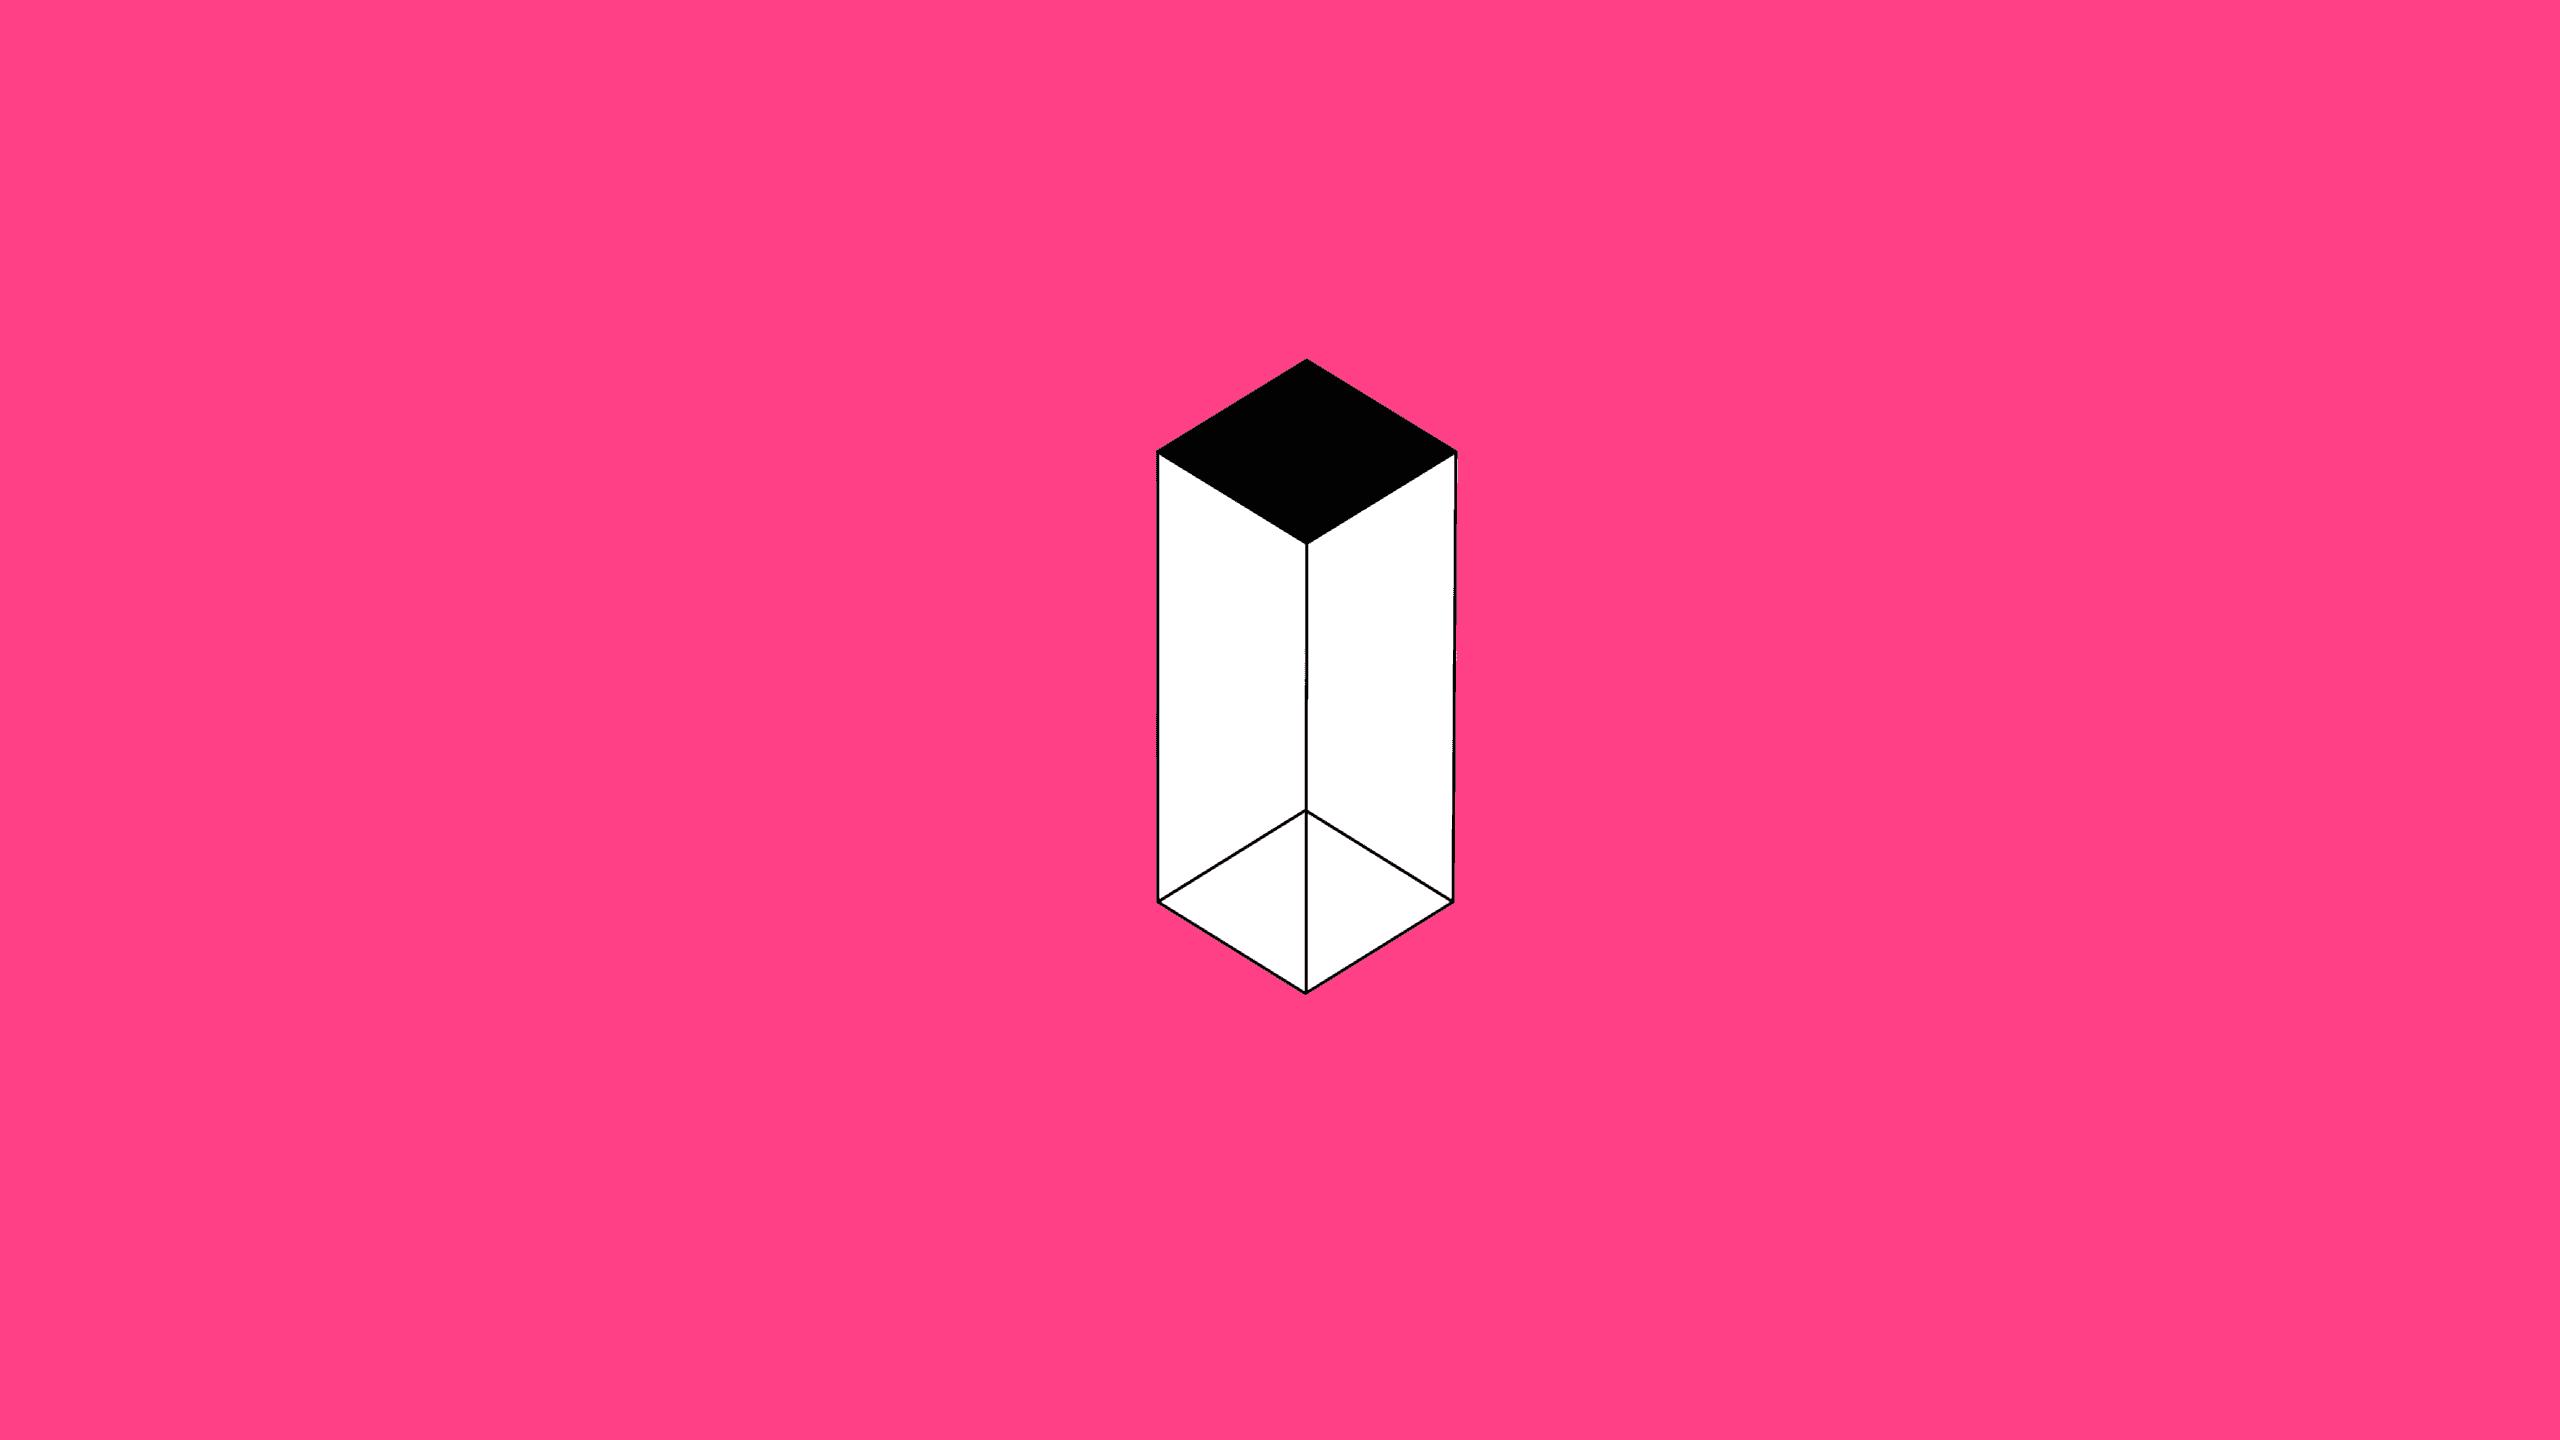 skyscraper-goes-pink